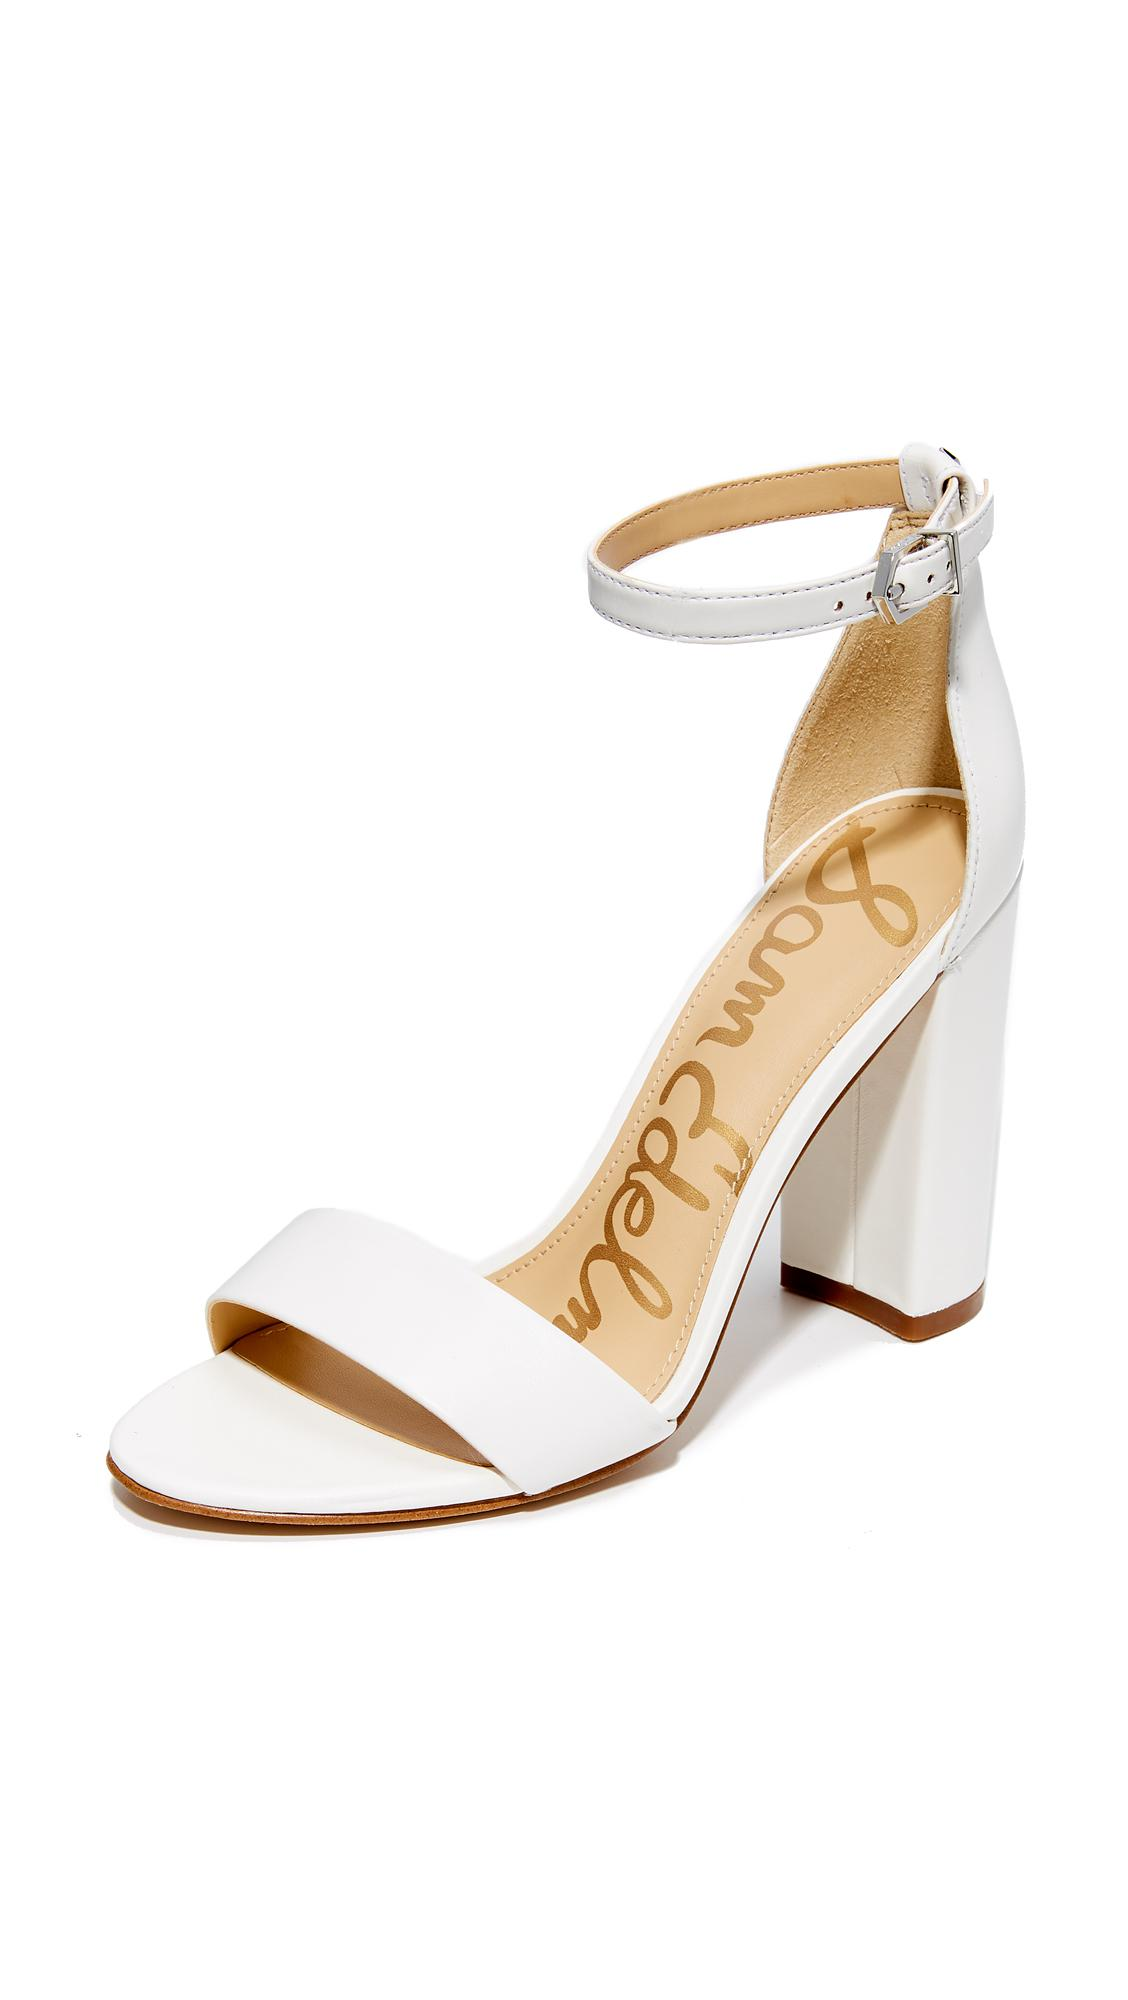 f6da09f156336 Sam Edelman Yaro Sandals in White - Lyst